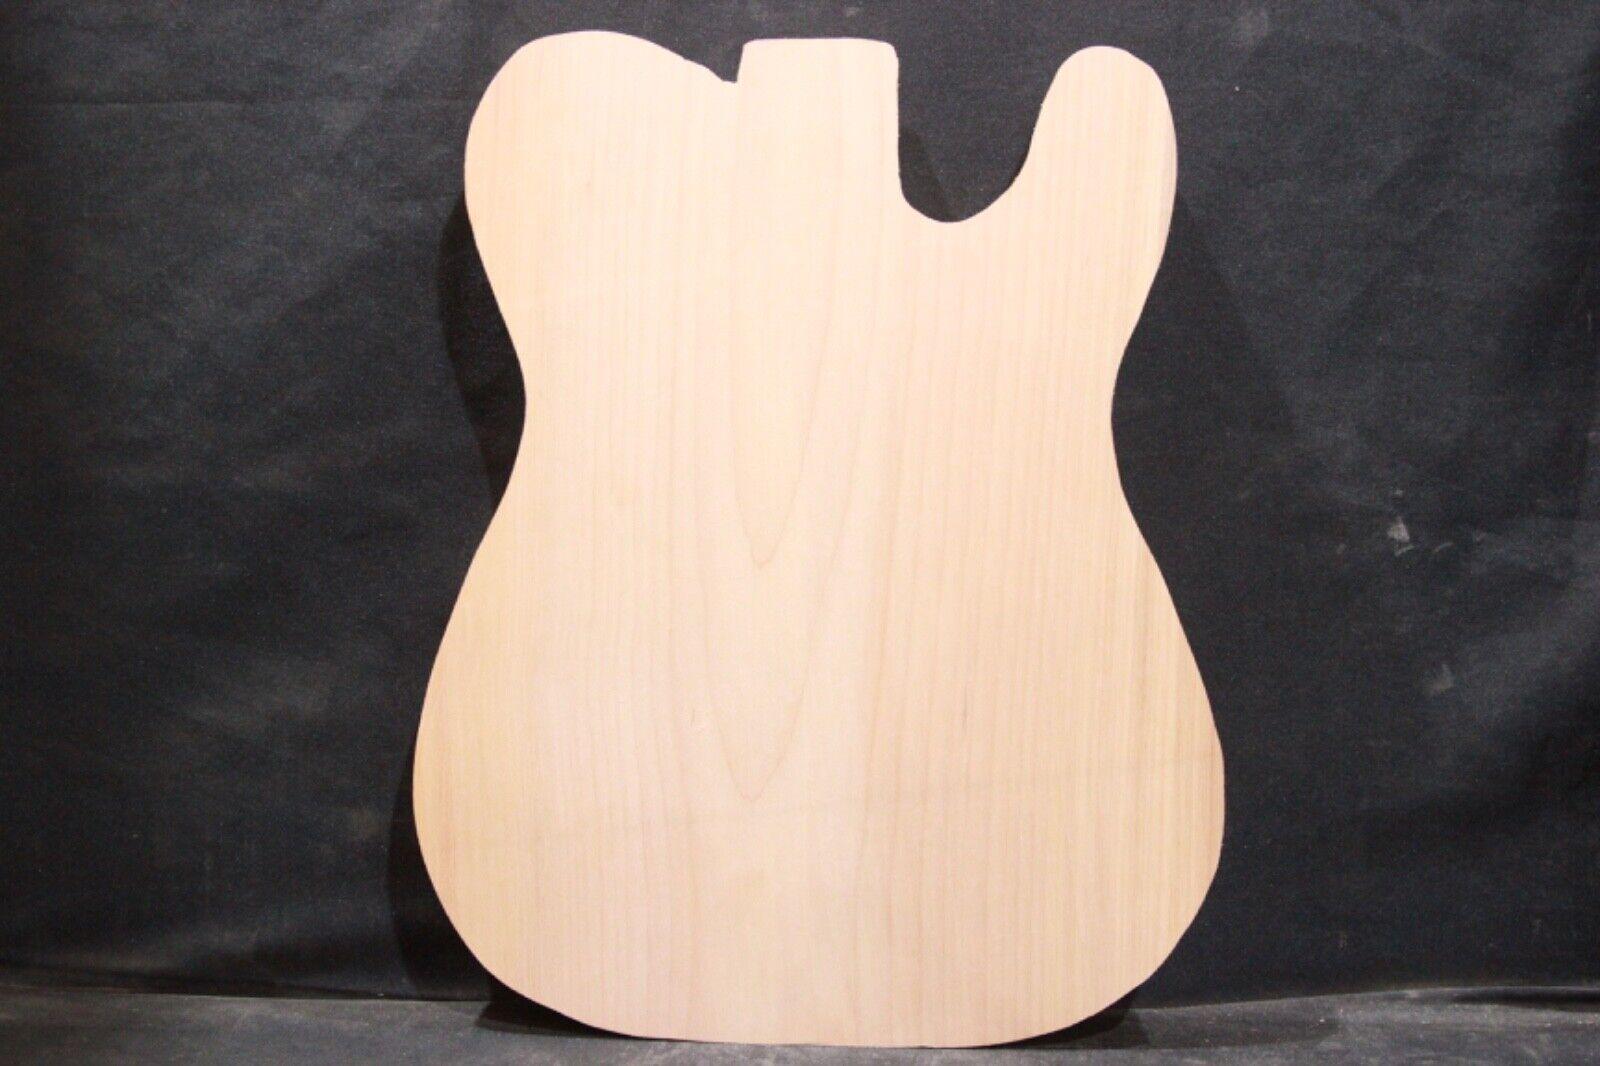 Alder  1-piece guitar body blank   Cut to  tele  shape    2386